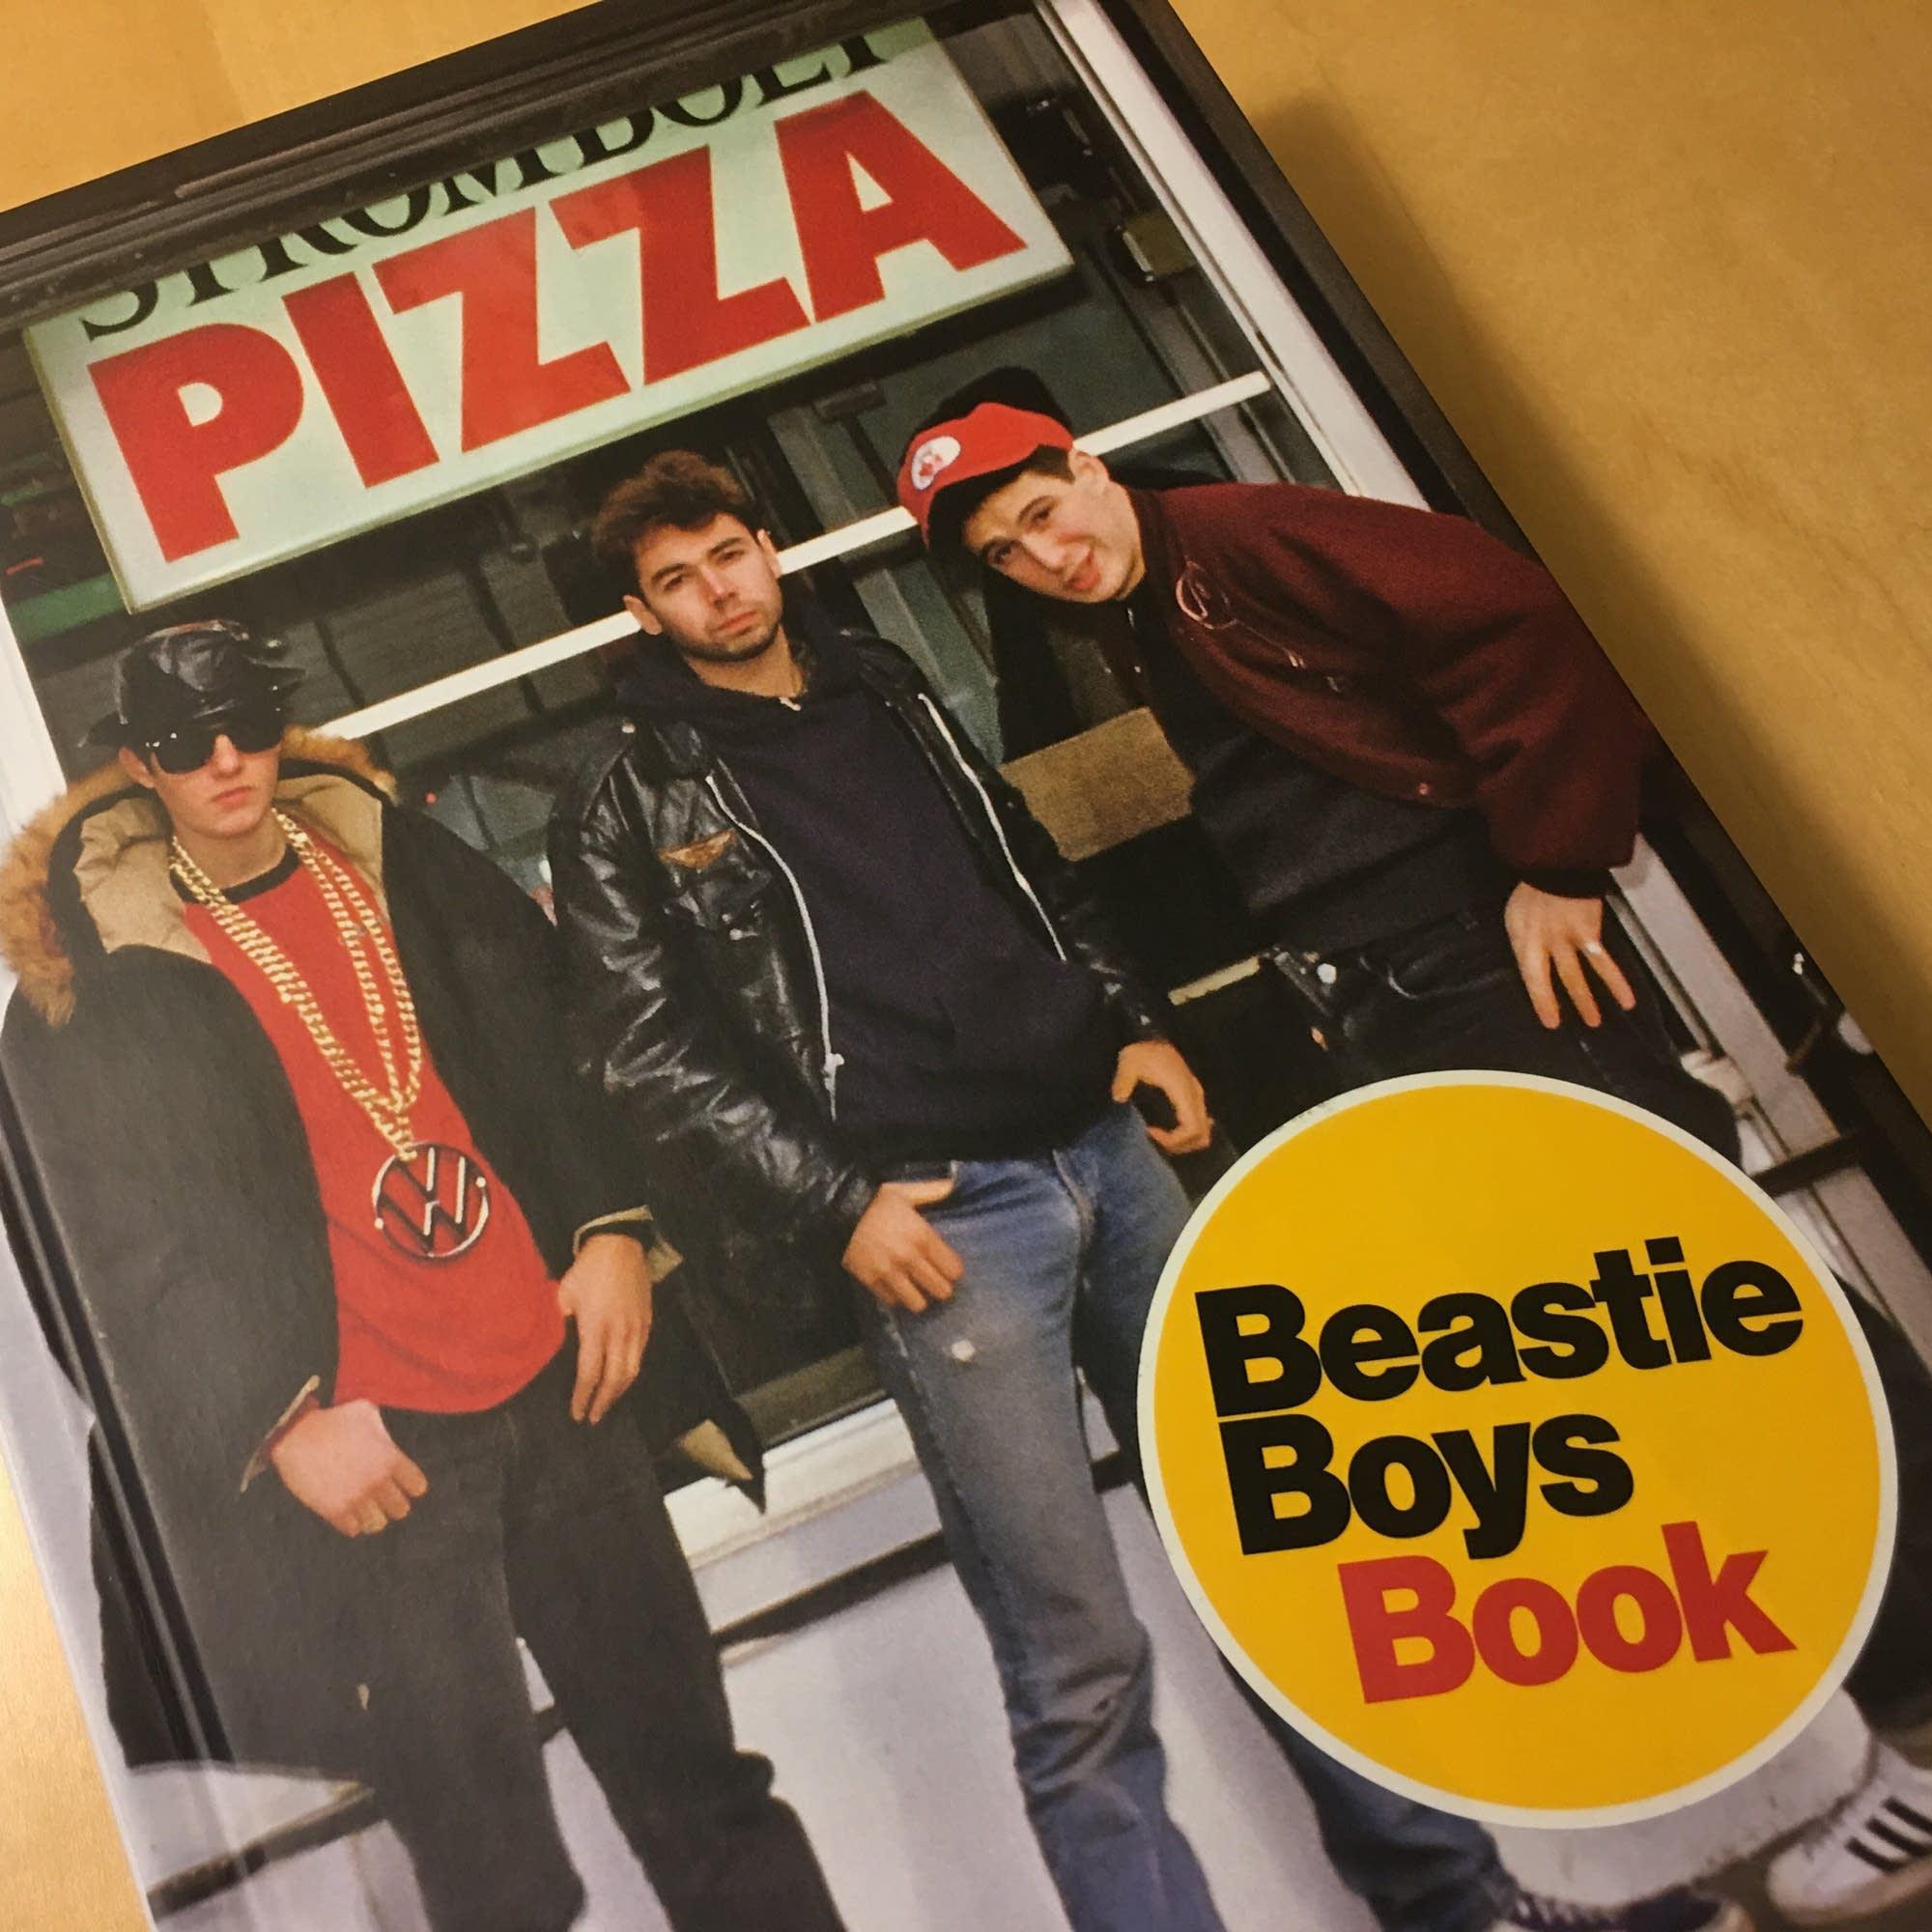 'Beastie Boys Book.'